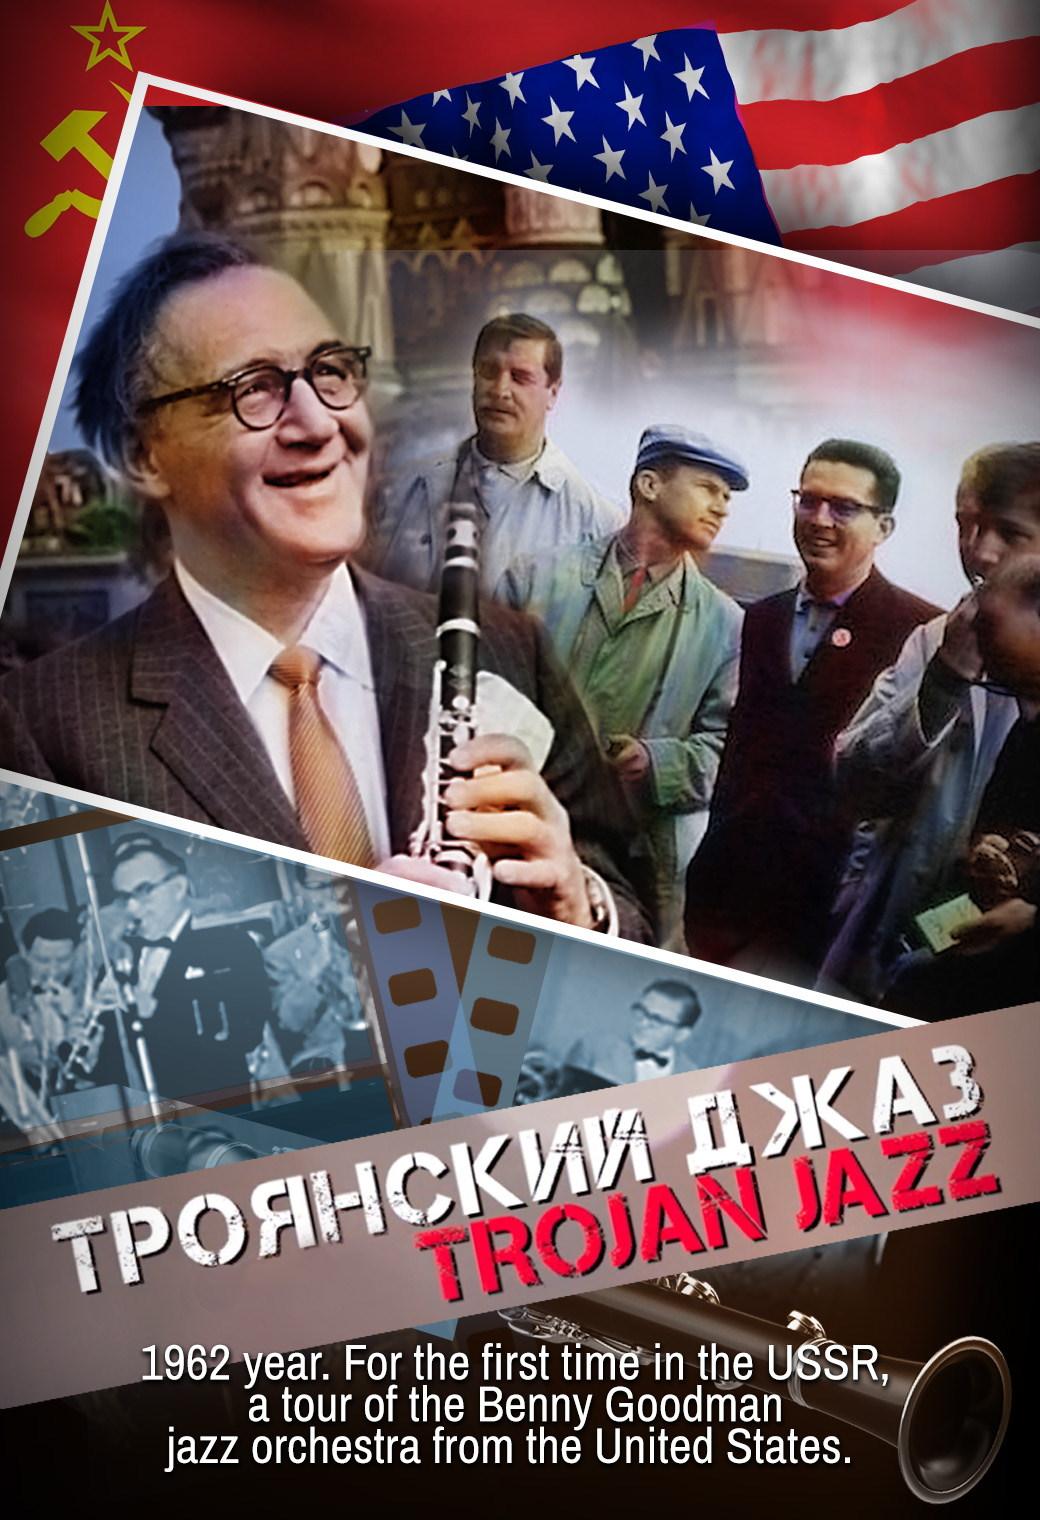 Trojan Jazz Movie Poster